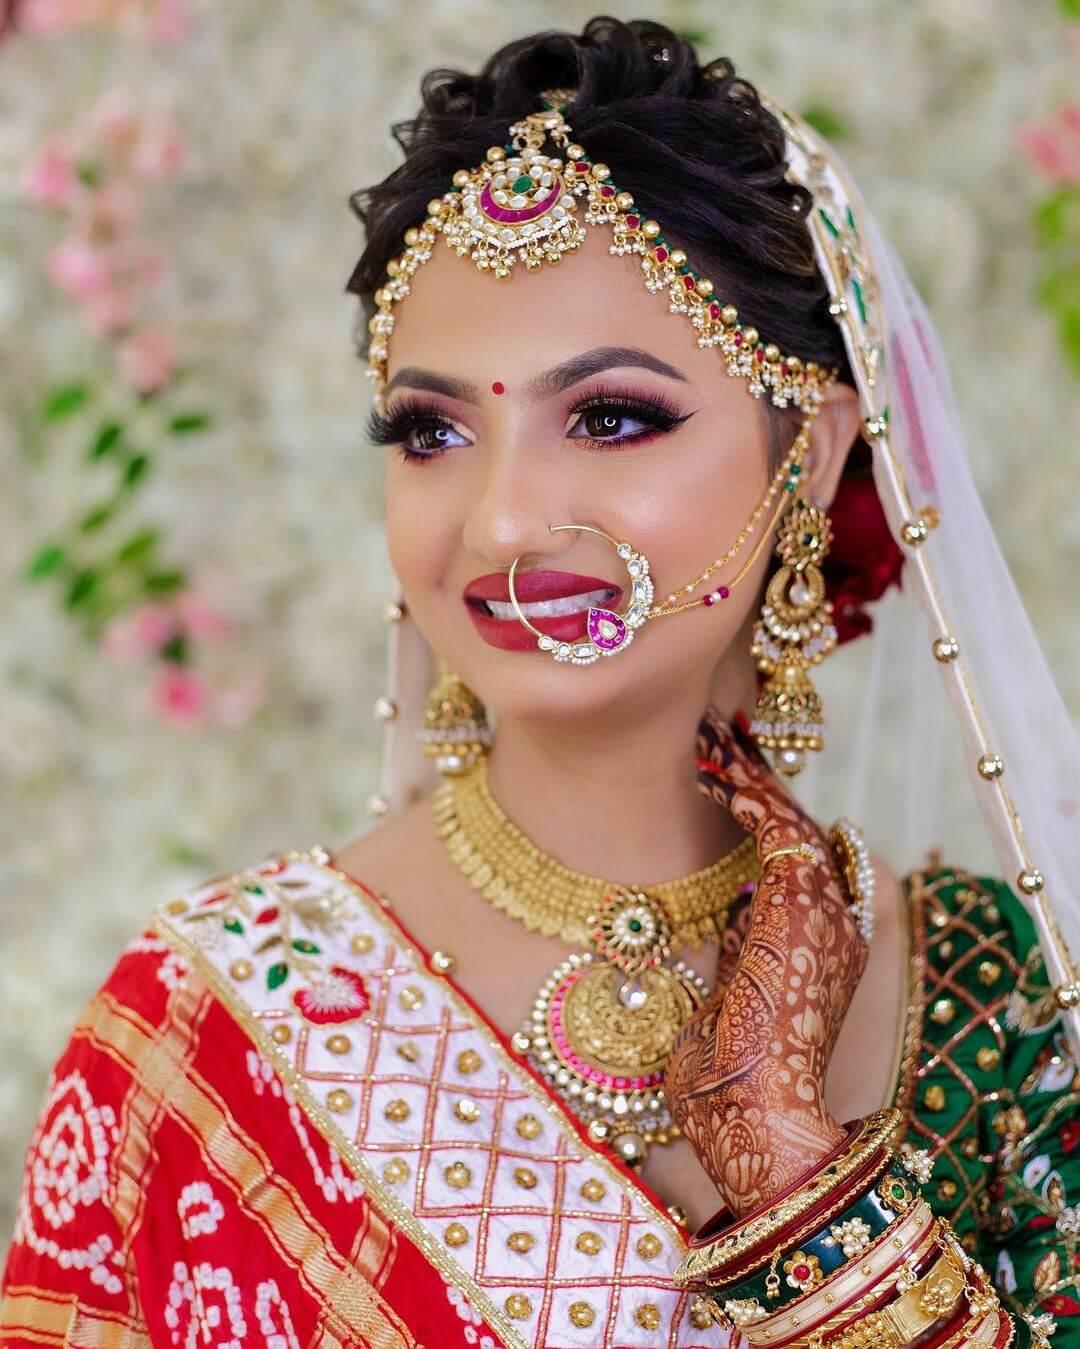 Traditional Bandhani bridal Look - traditional Gujarati bridal makeup looks